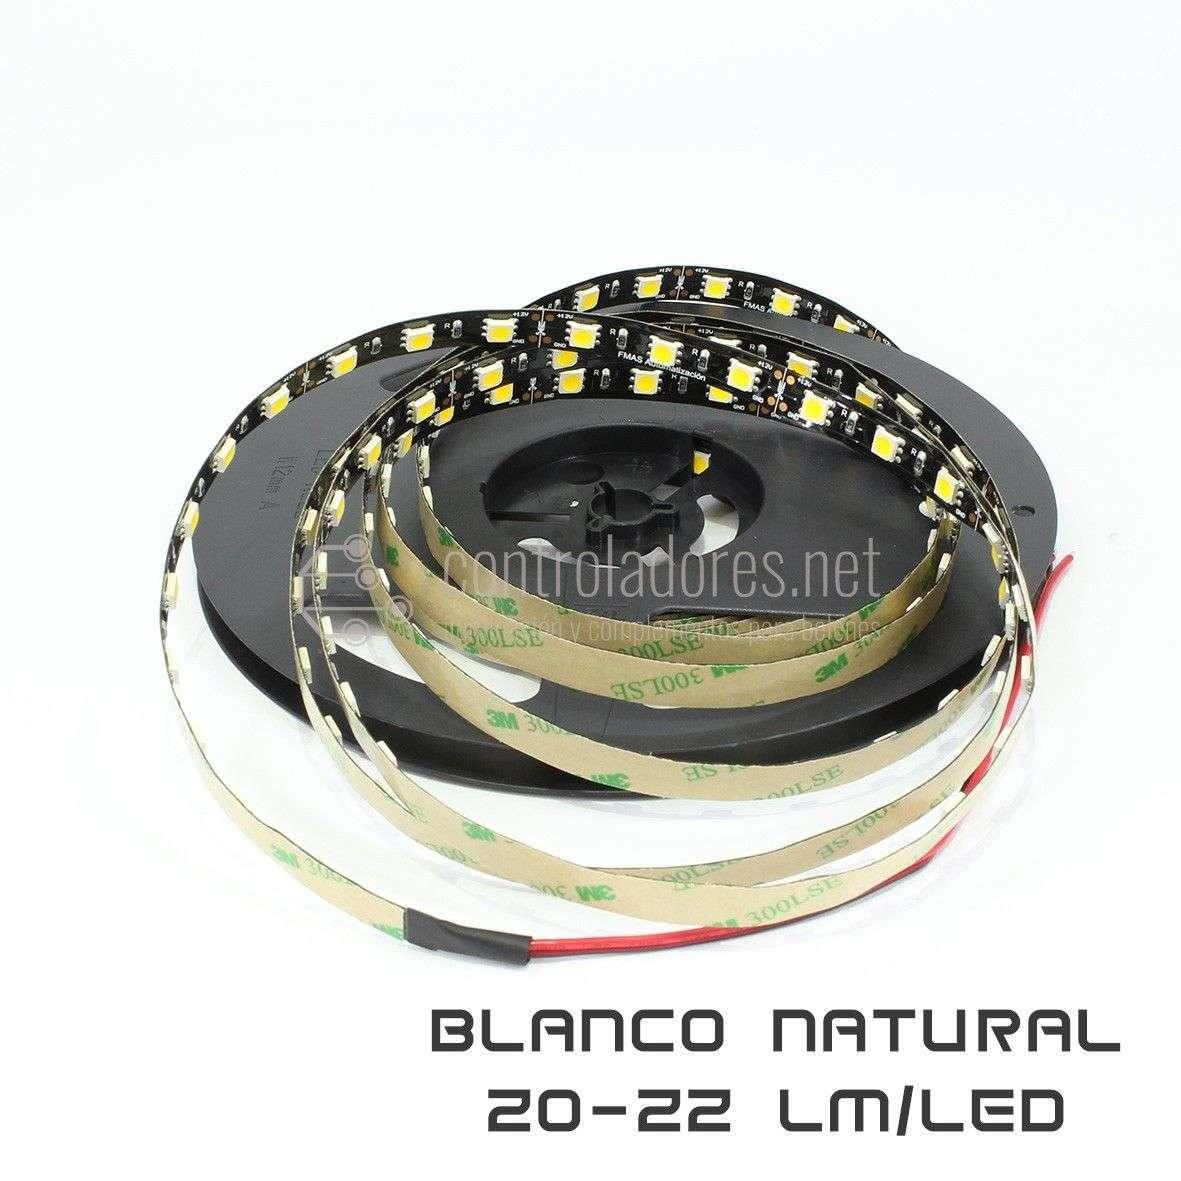 Tira LED Profesional BLANCO NATURAL máxima luminosidad 20-22lm/LED